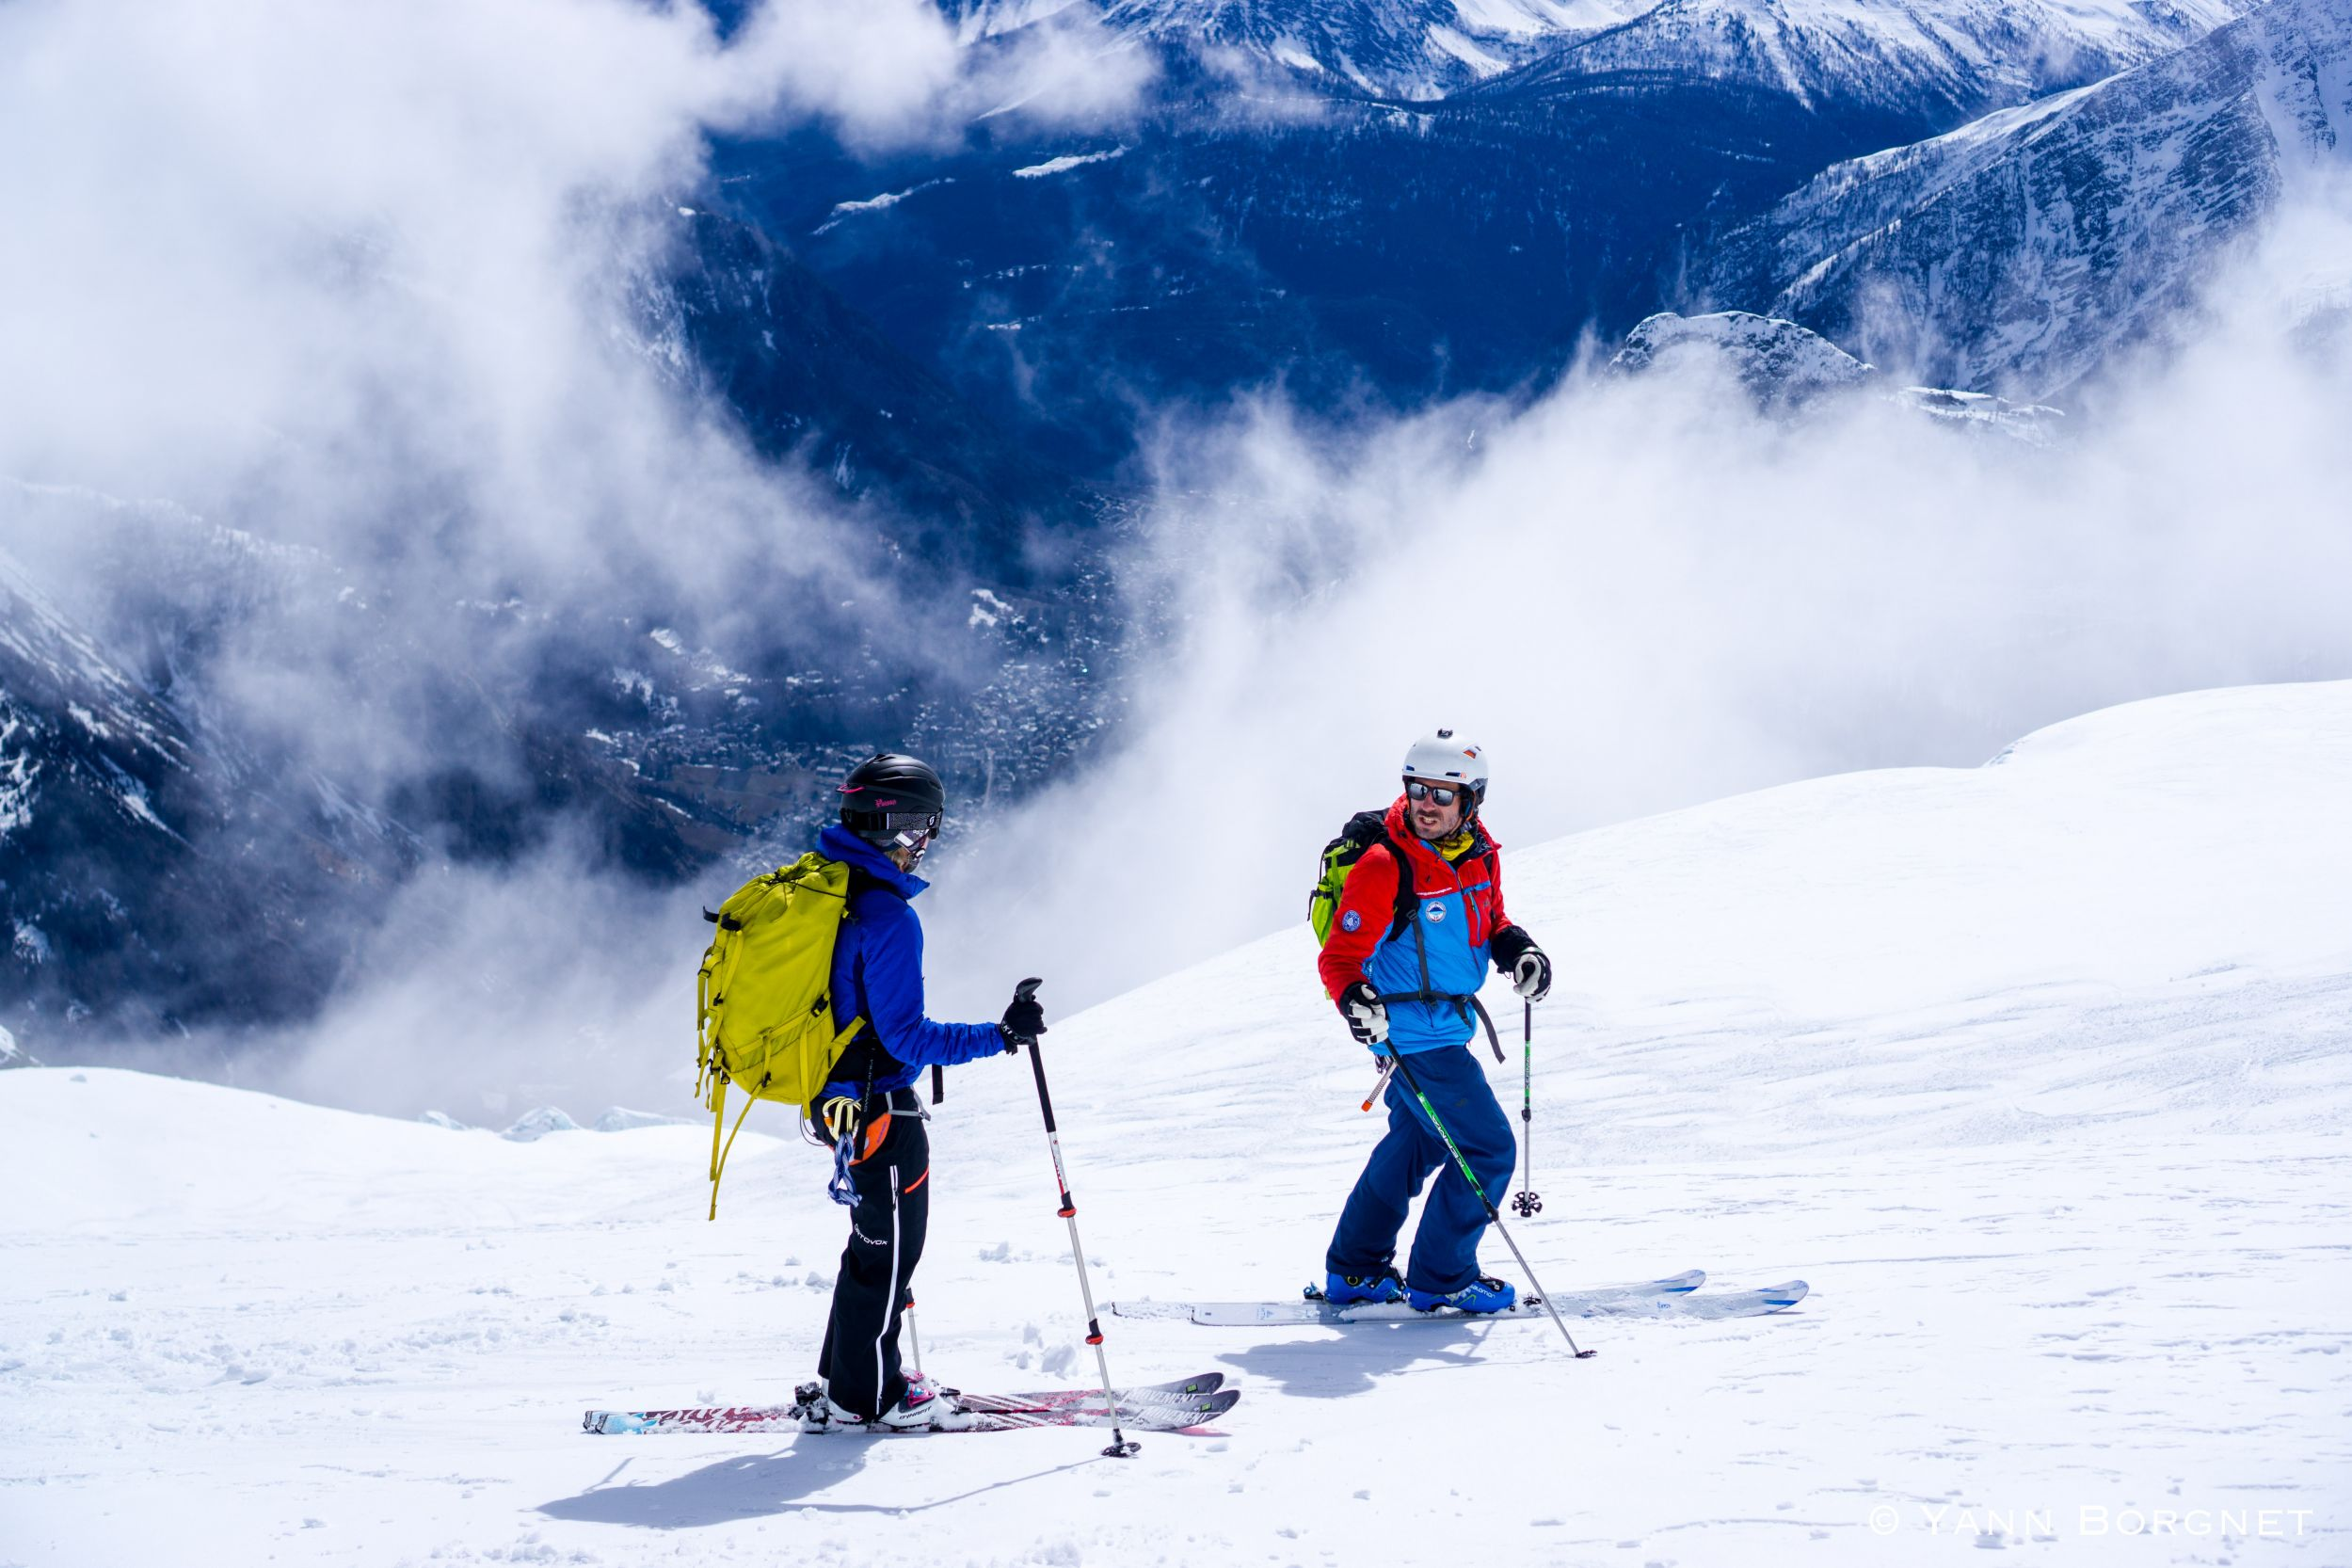 Sortie ski dans la Vallée Blanche-Chamonix image 2